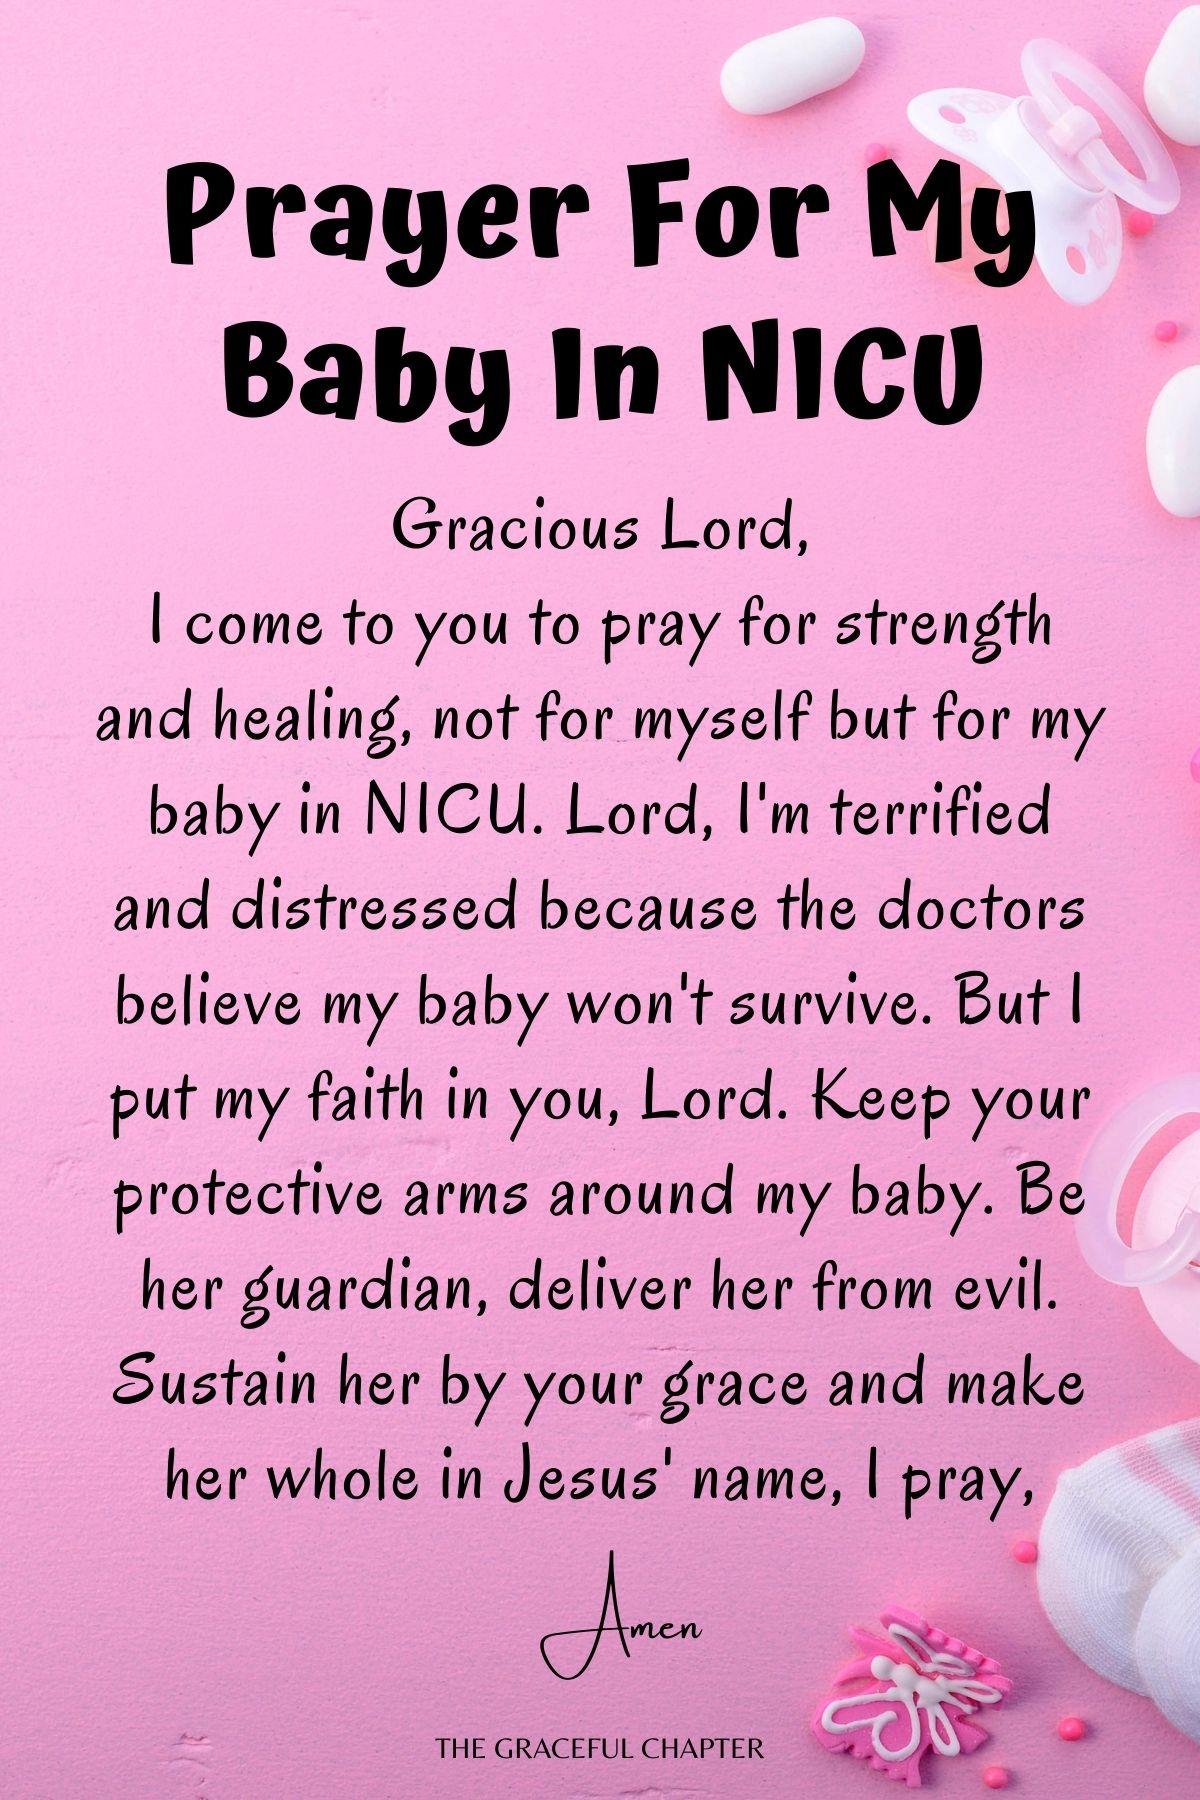 Prayer for my baby in NICU